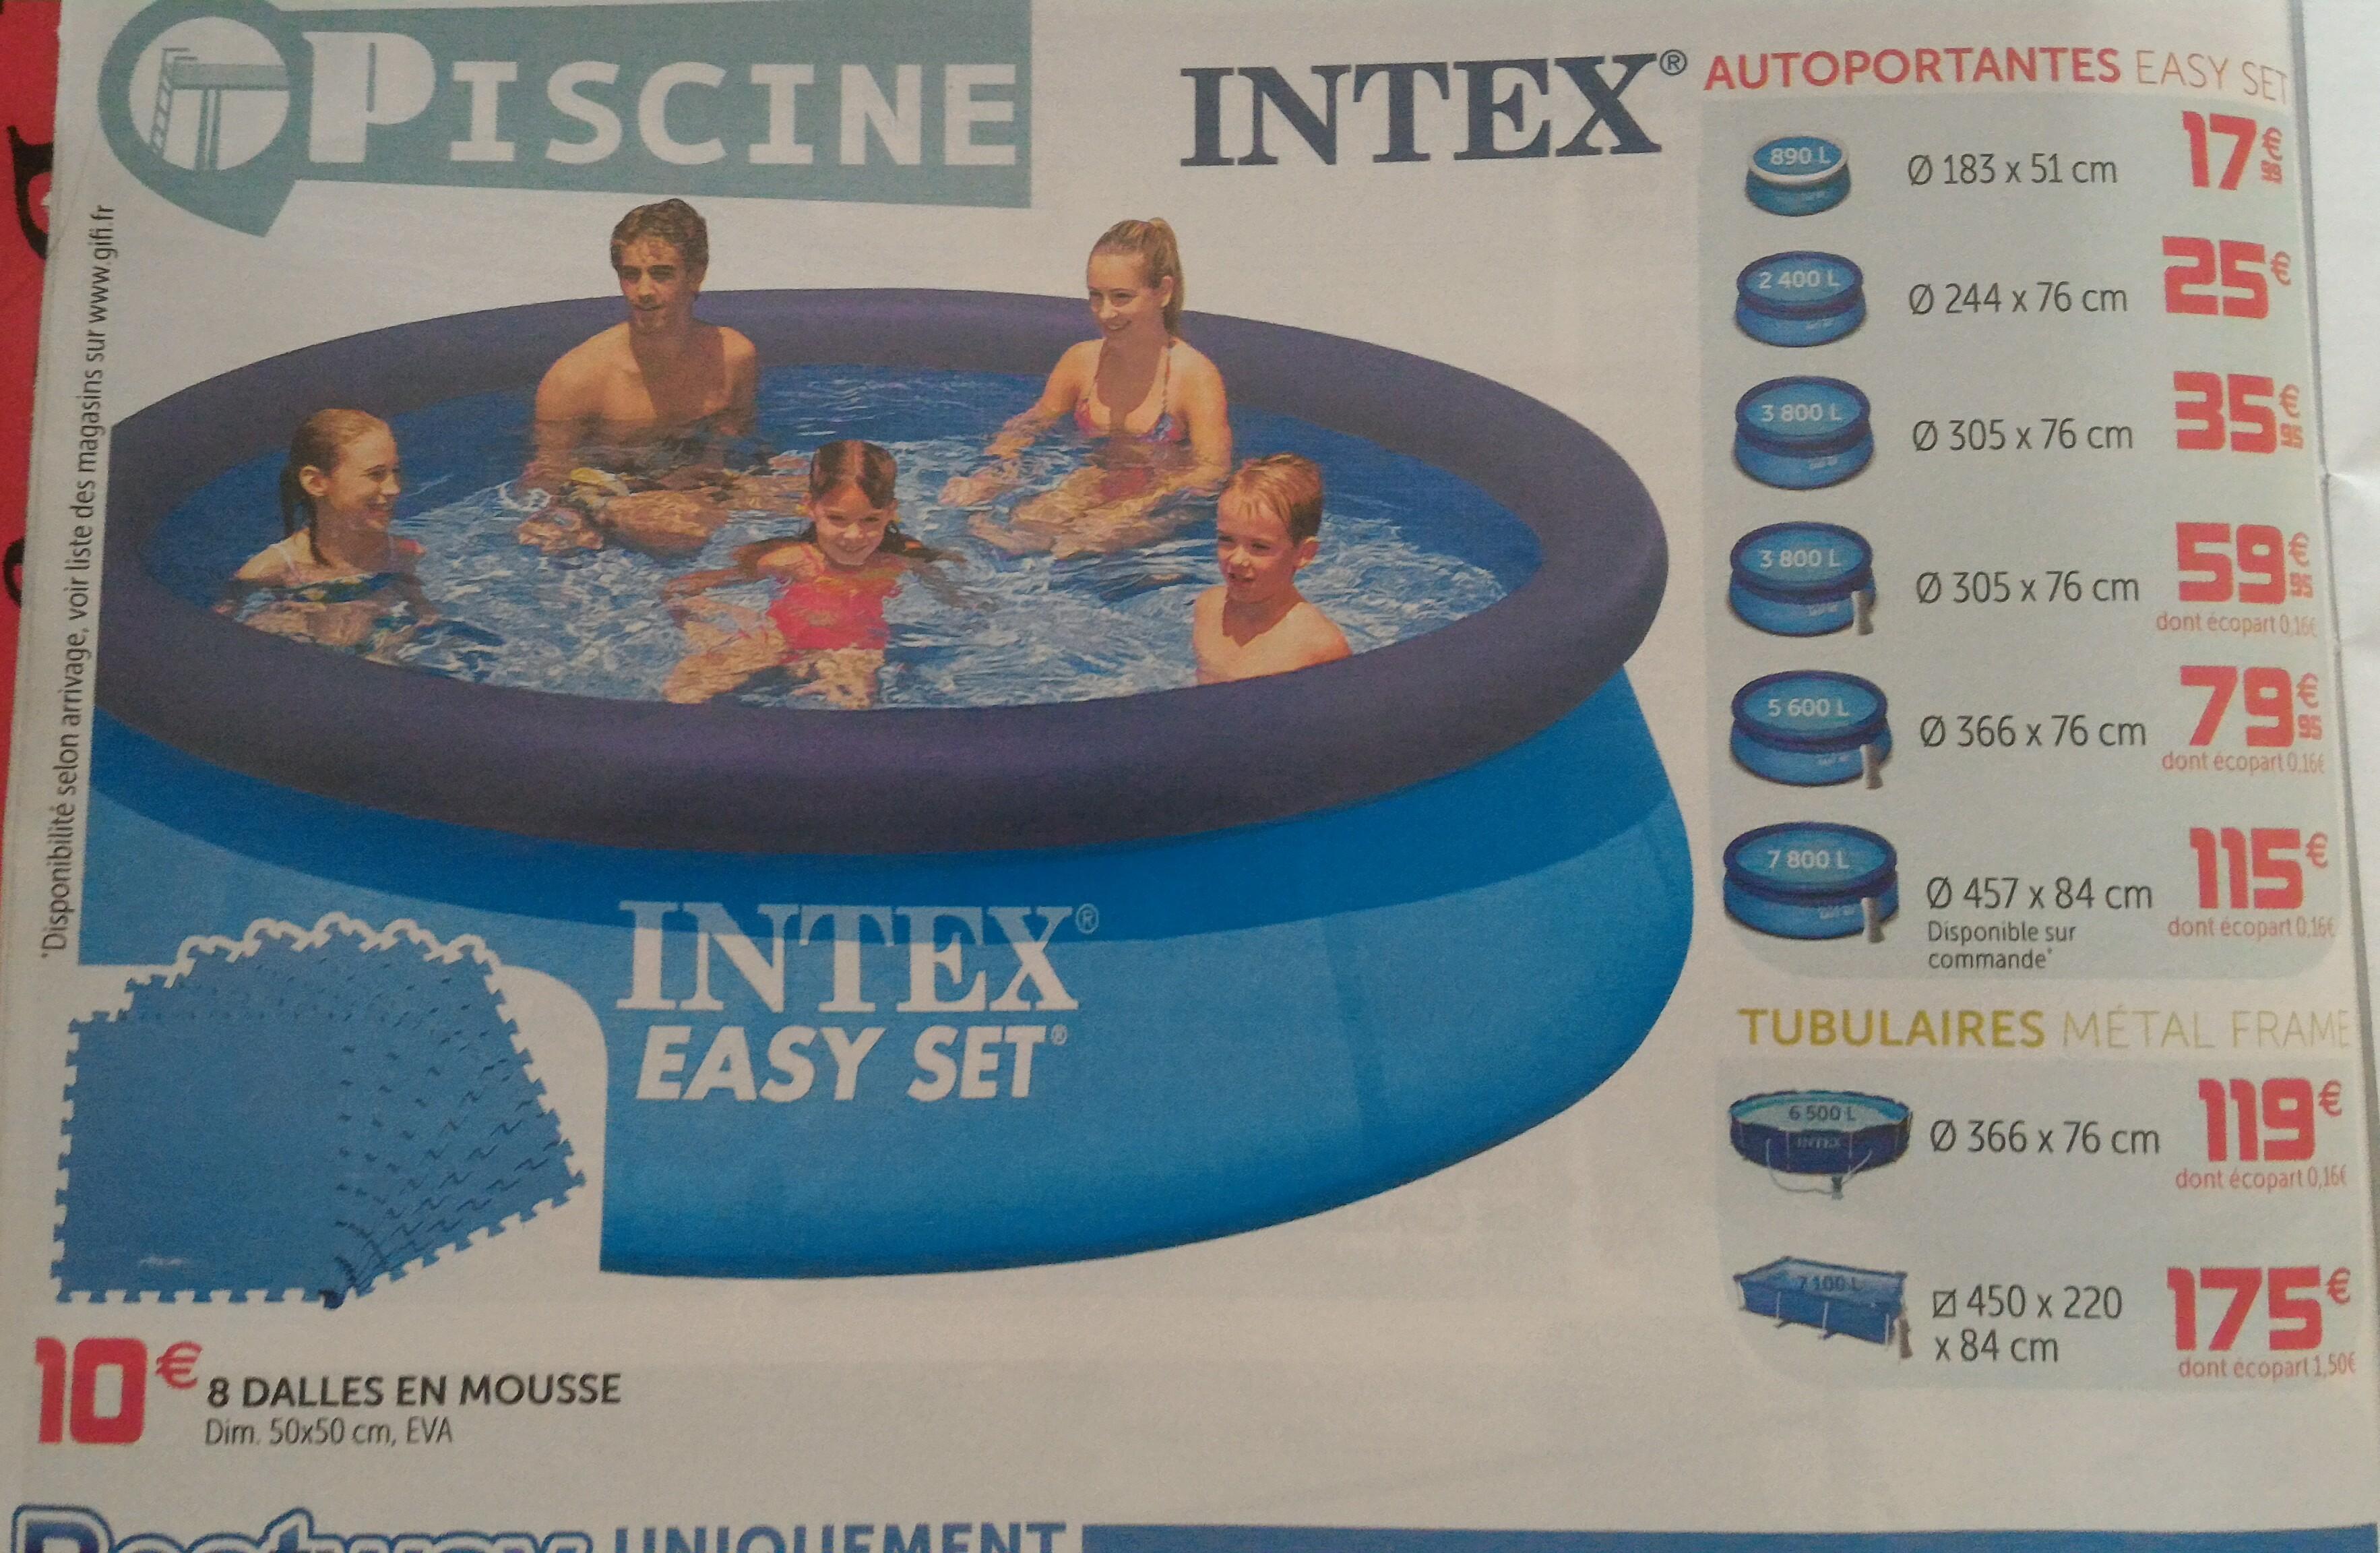 Piscine Intex autoportante Easy Set - 244 x 76 cm